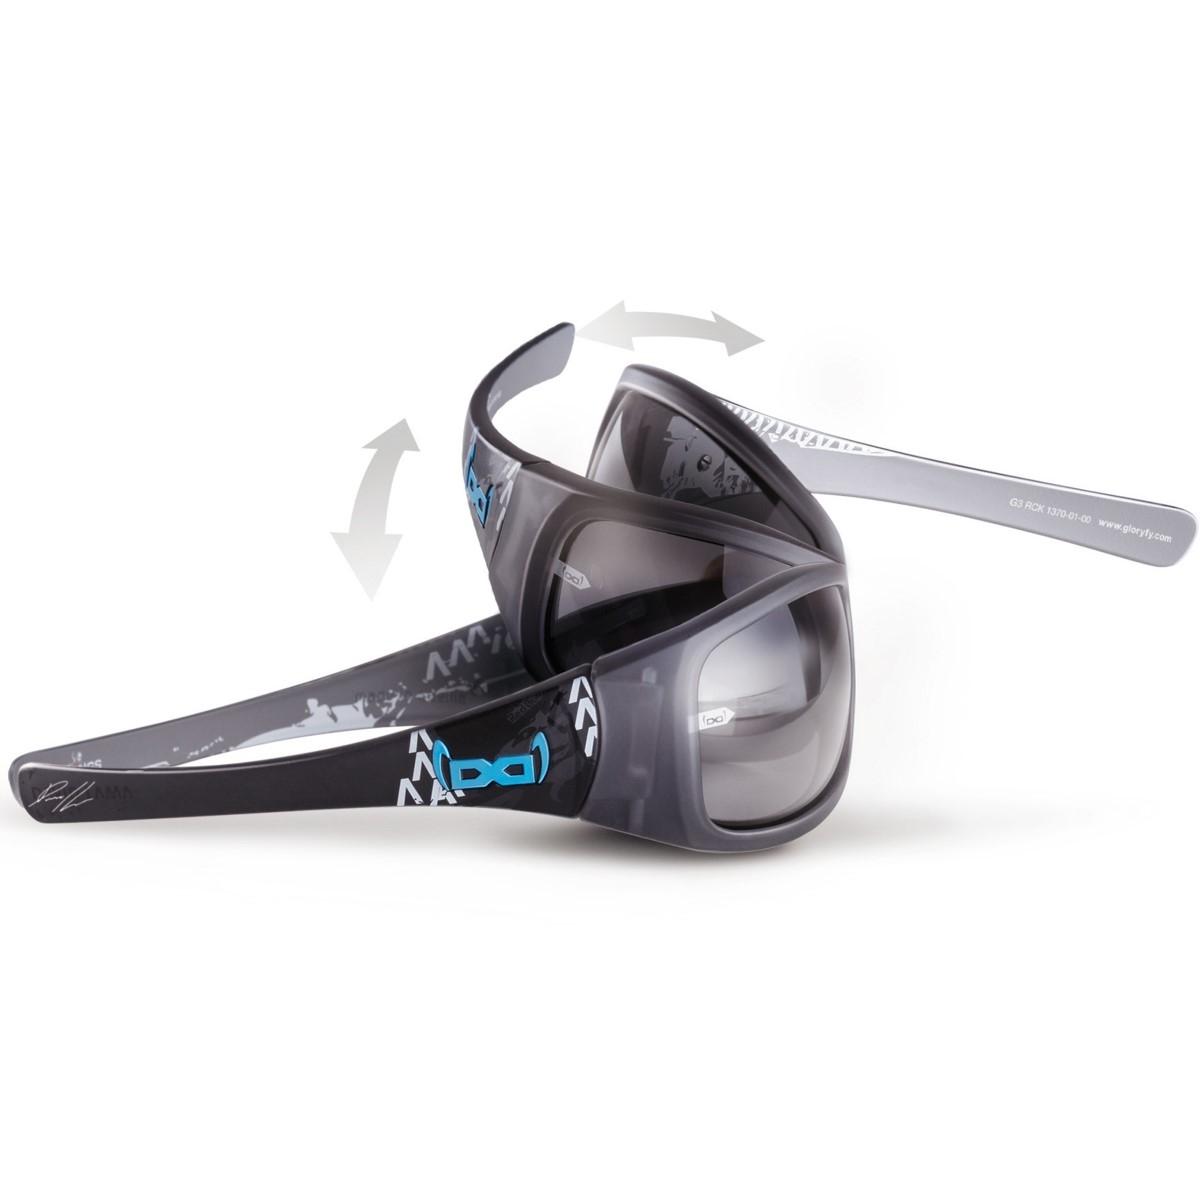 jetzt bestellen gloryfy sonnenbrille g3 magic mushroom air by roger sch li braun t rkis. Black Bedroom Furniture Sets. Home Design Ideas